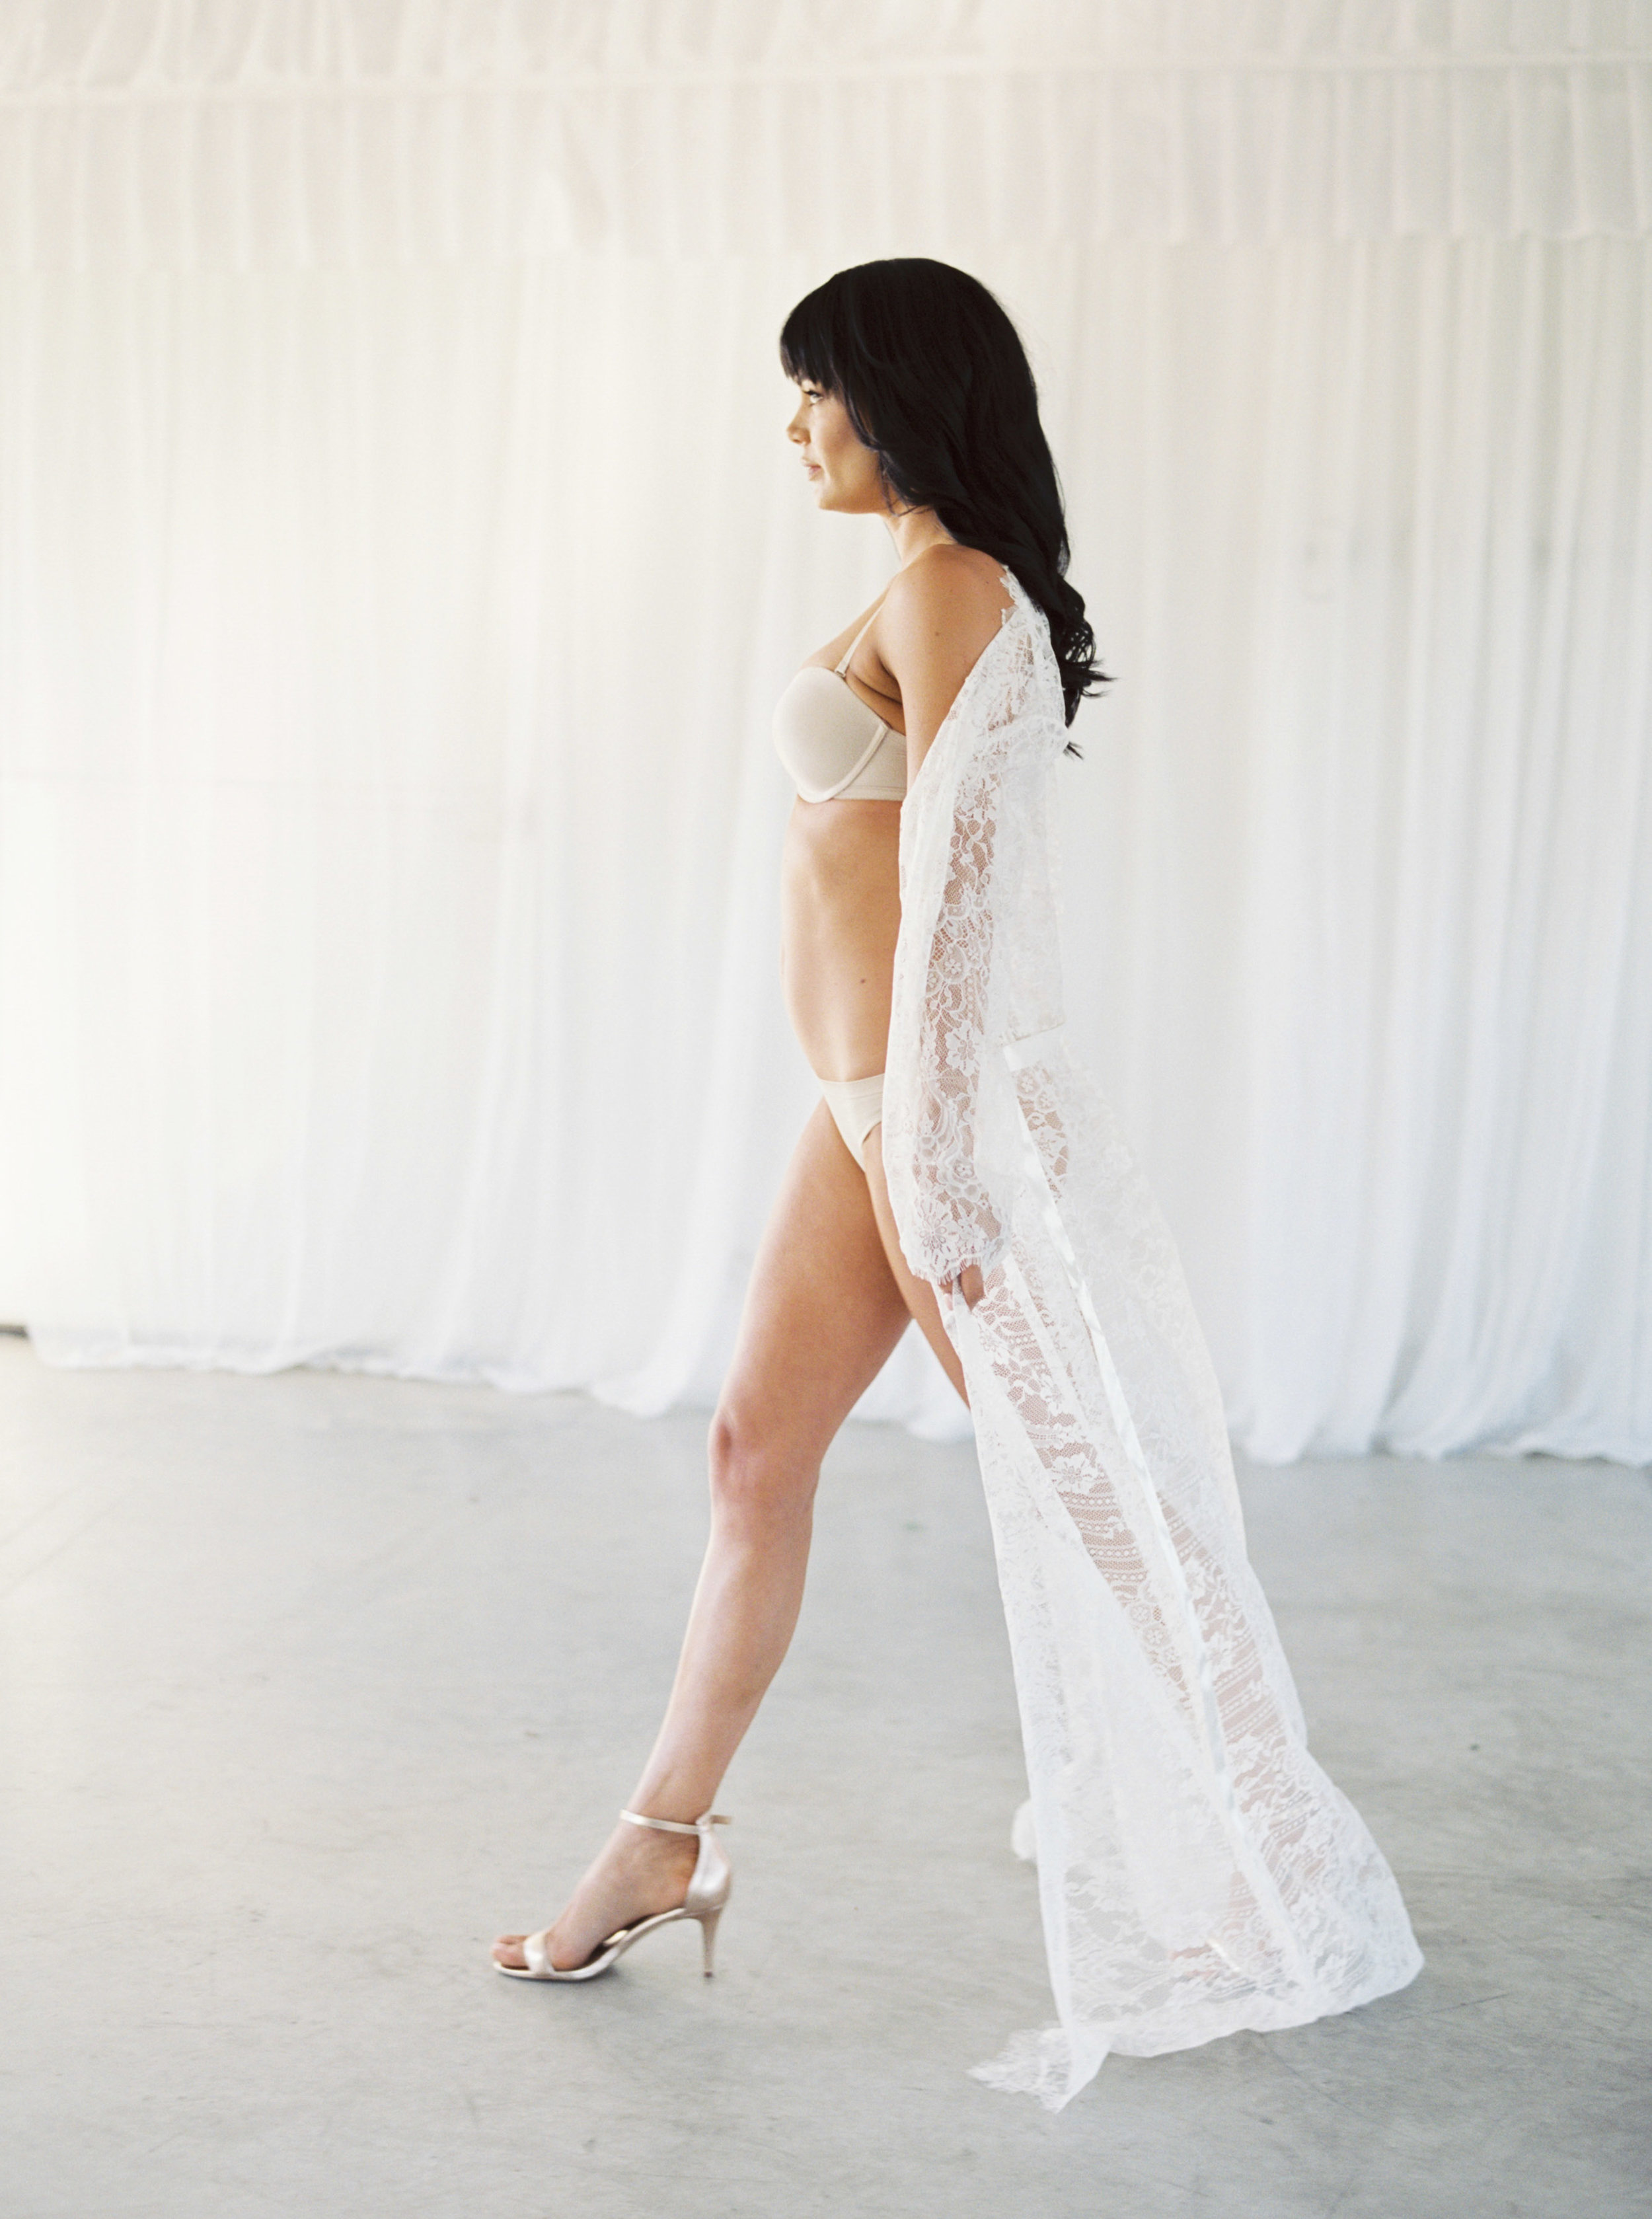 00005- Mudgee Wedding Photographer Sheri McMahon.jpg